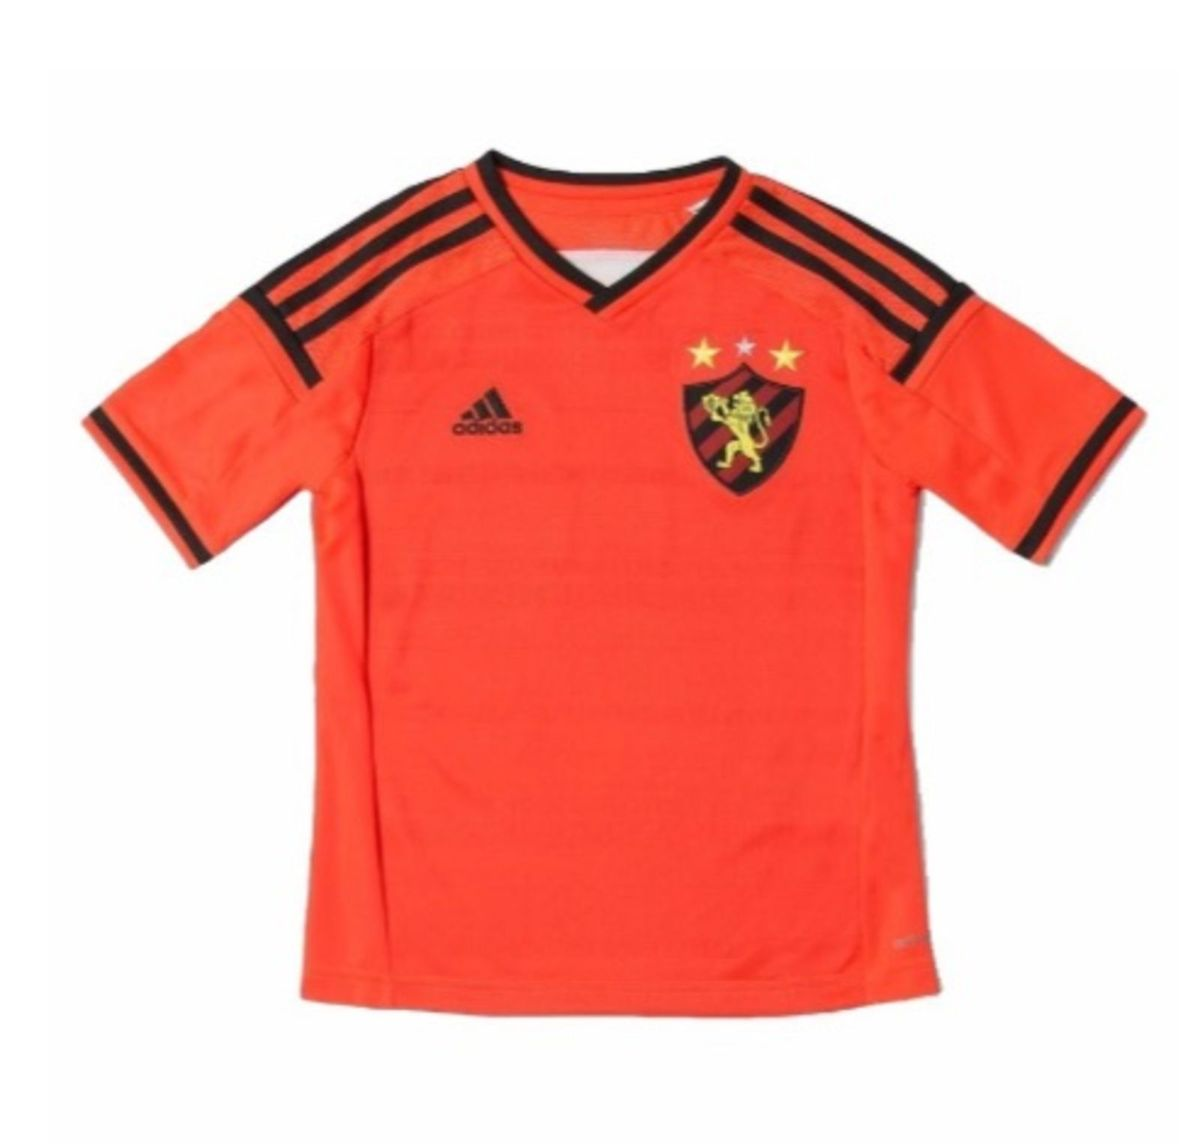 8d24b69208c67 camisa sport recife adidas infantil laranja - menino adidas